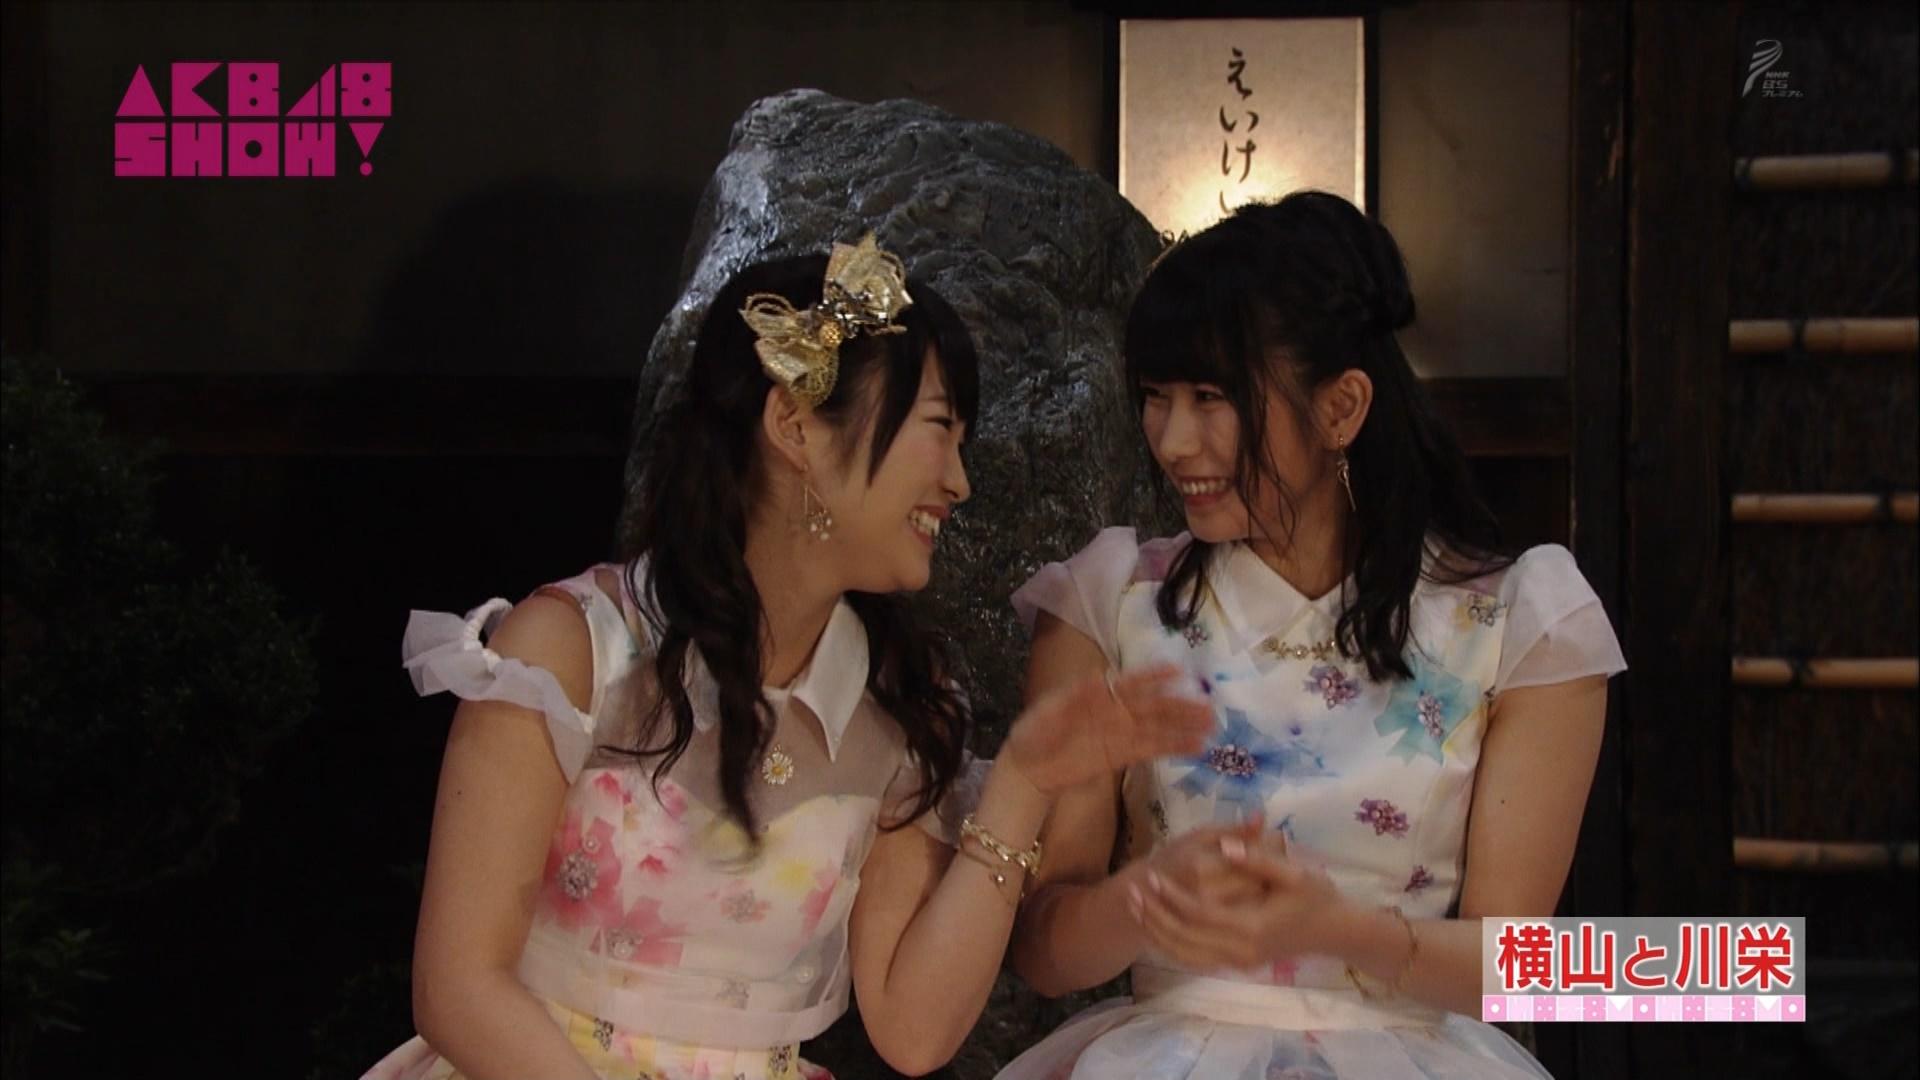 横山由依と川栄李奈 AKB48SHOW! 20140906 (43)